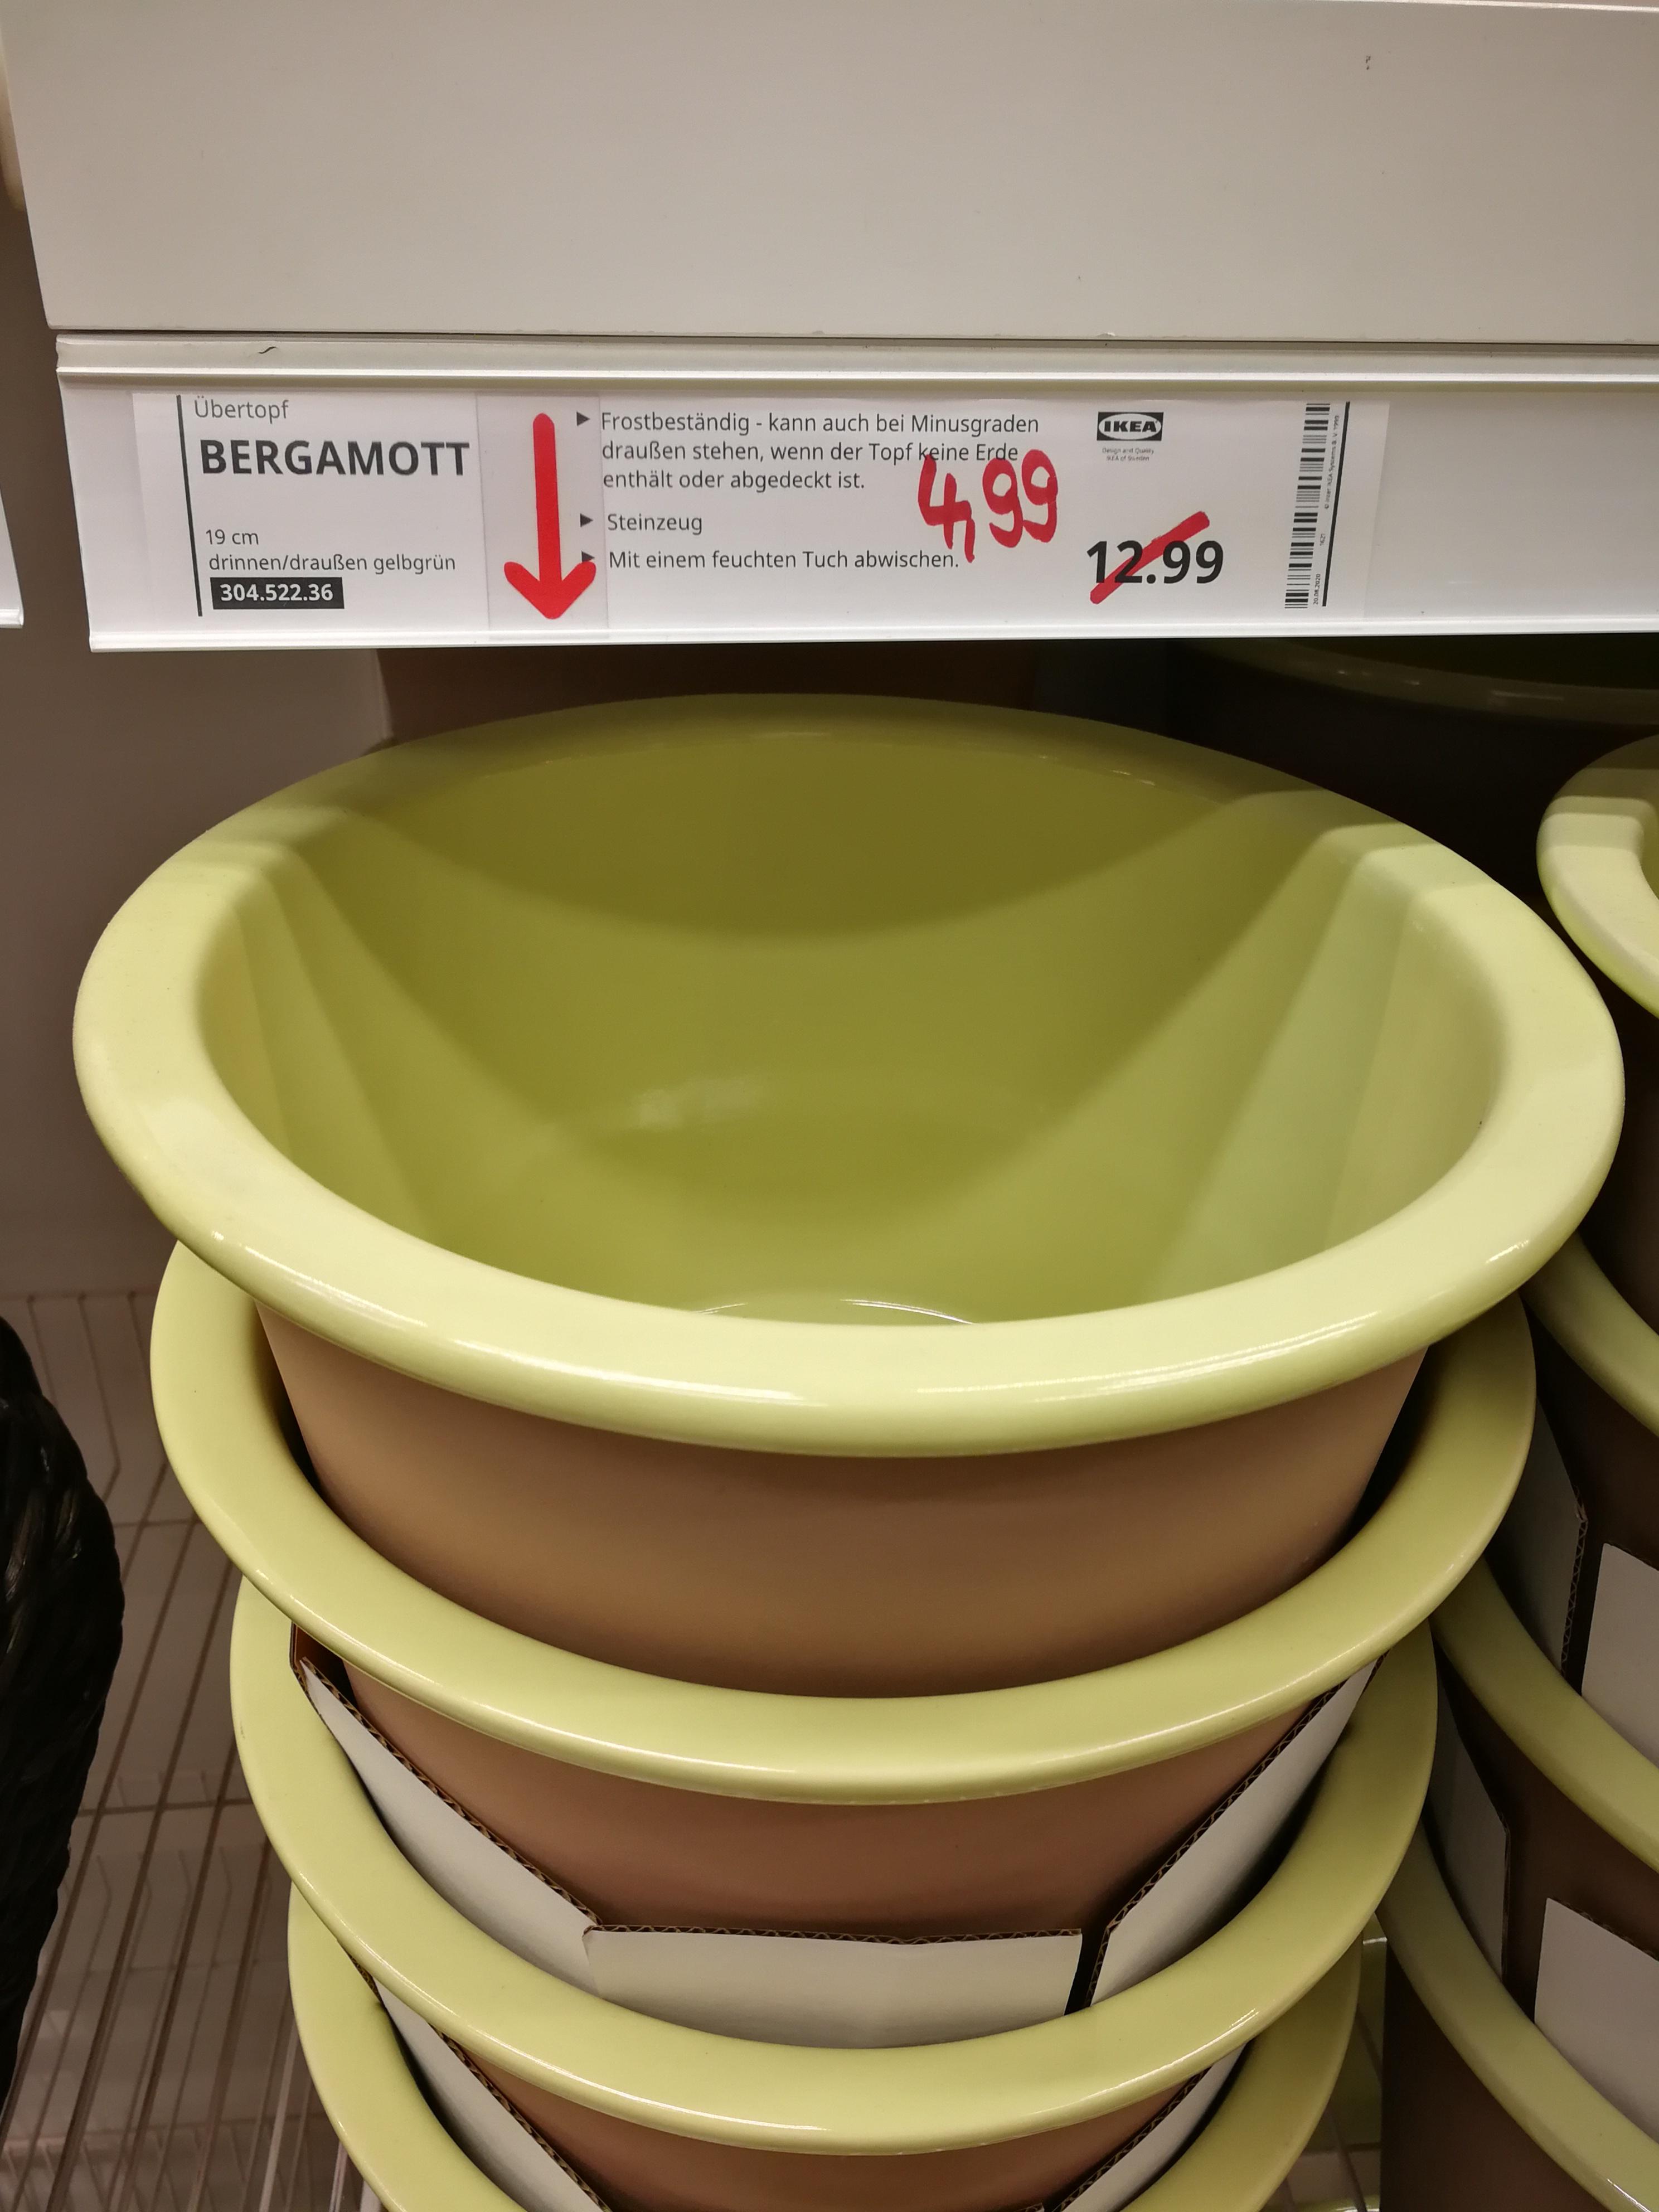 IKEA ÜBERTOPF BERGAMOTT STEINGUT INNEN/AUSSEN D-21cm GRÜN/BRAUN